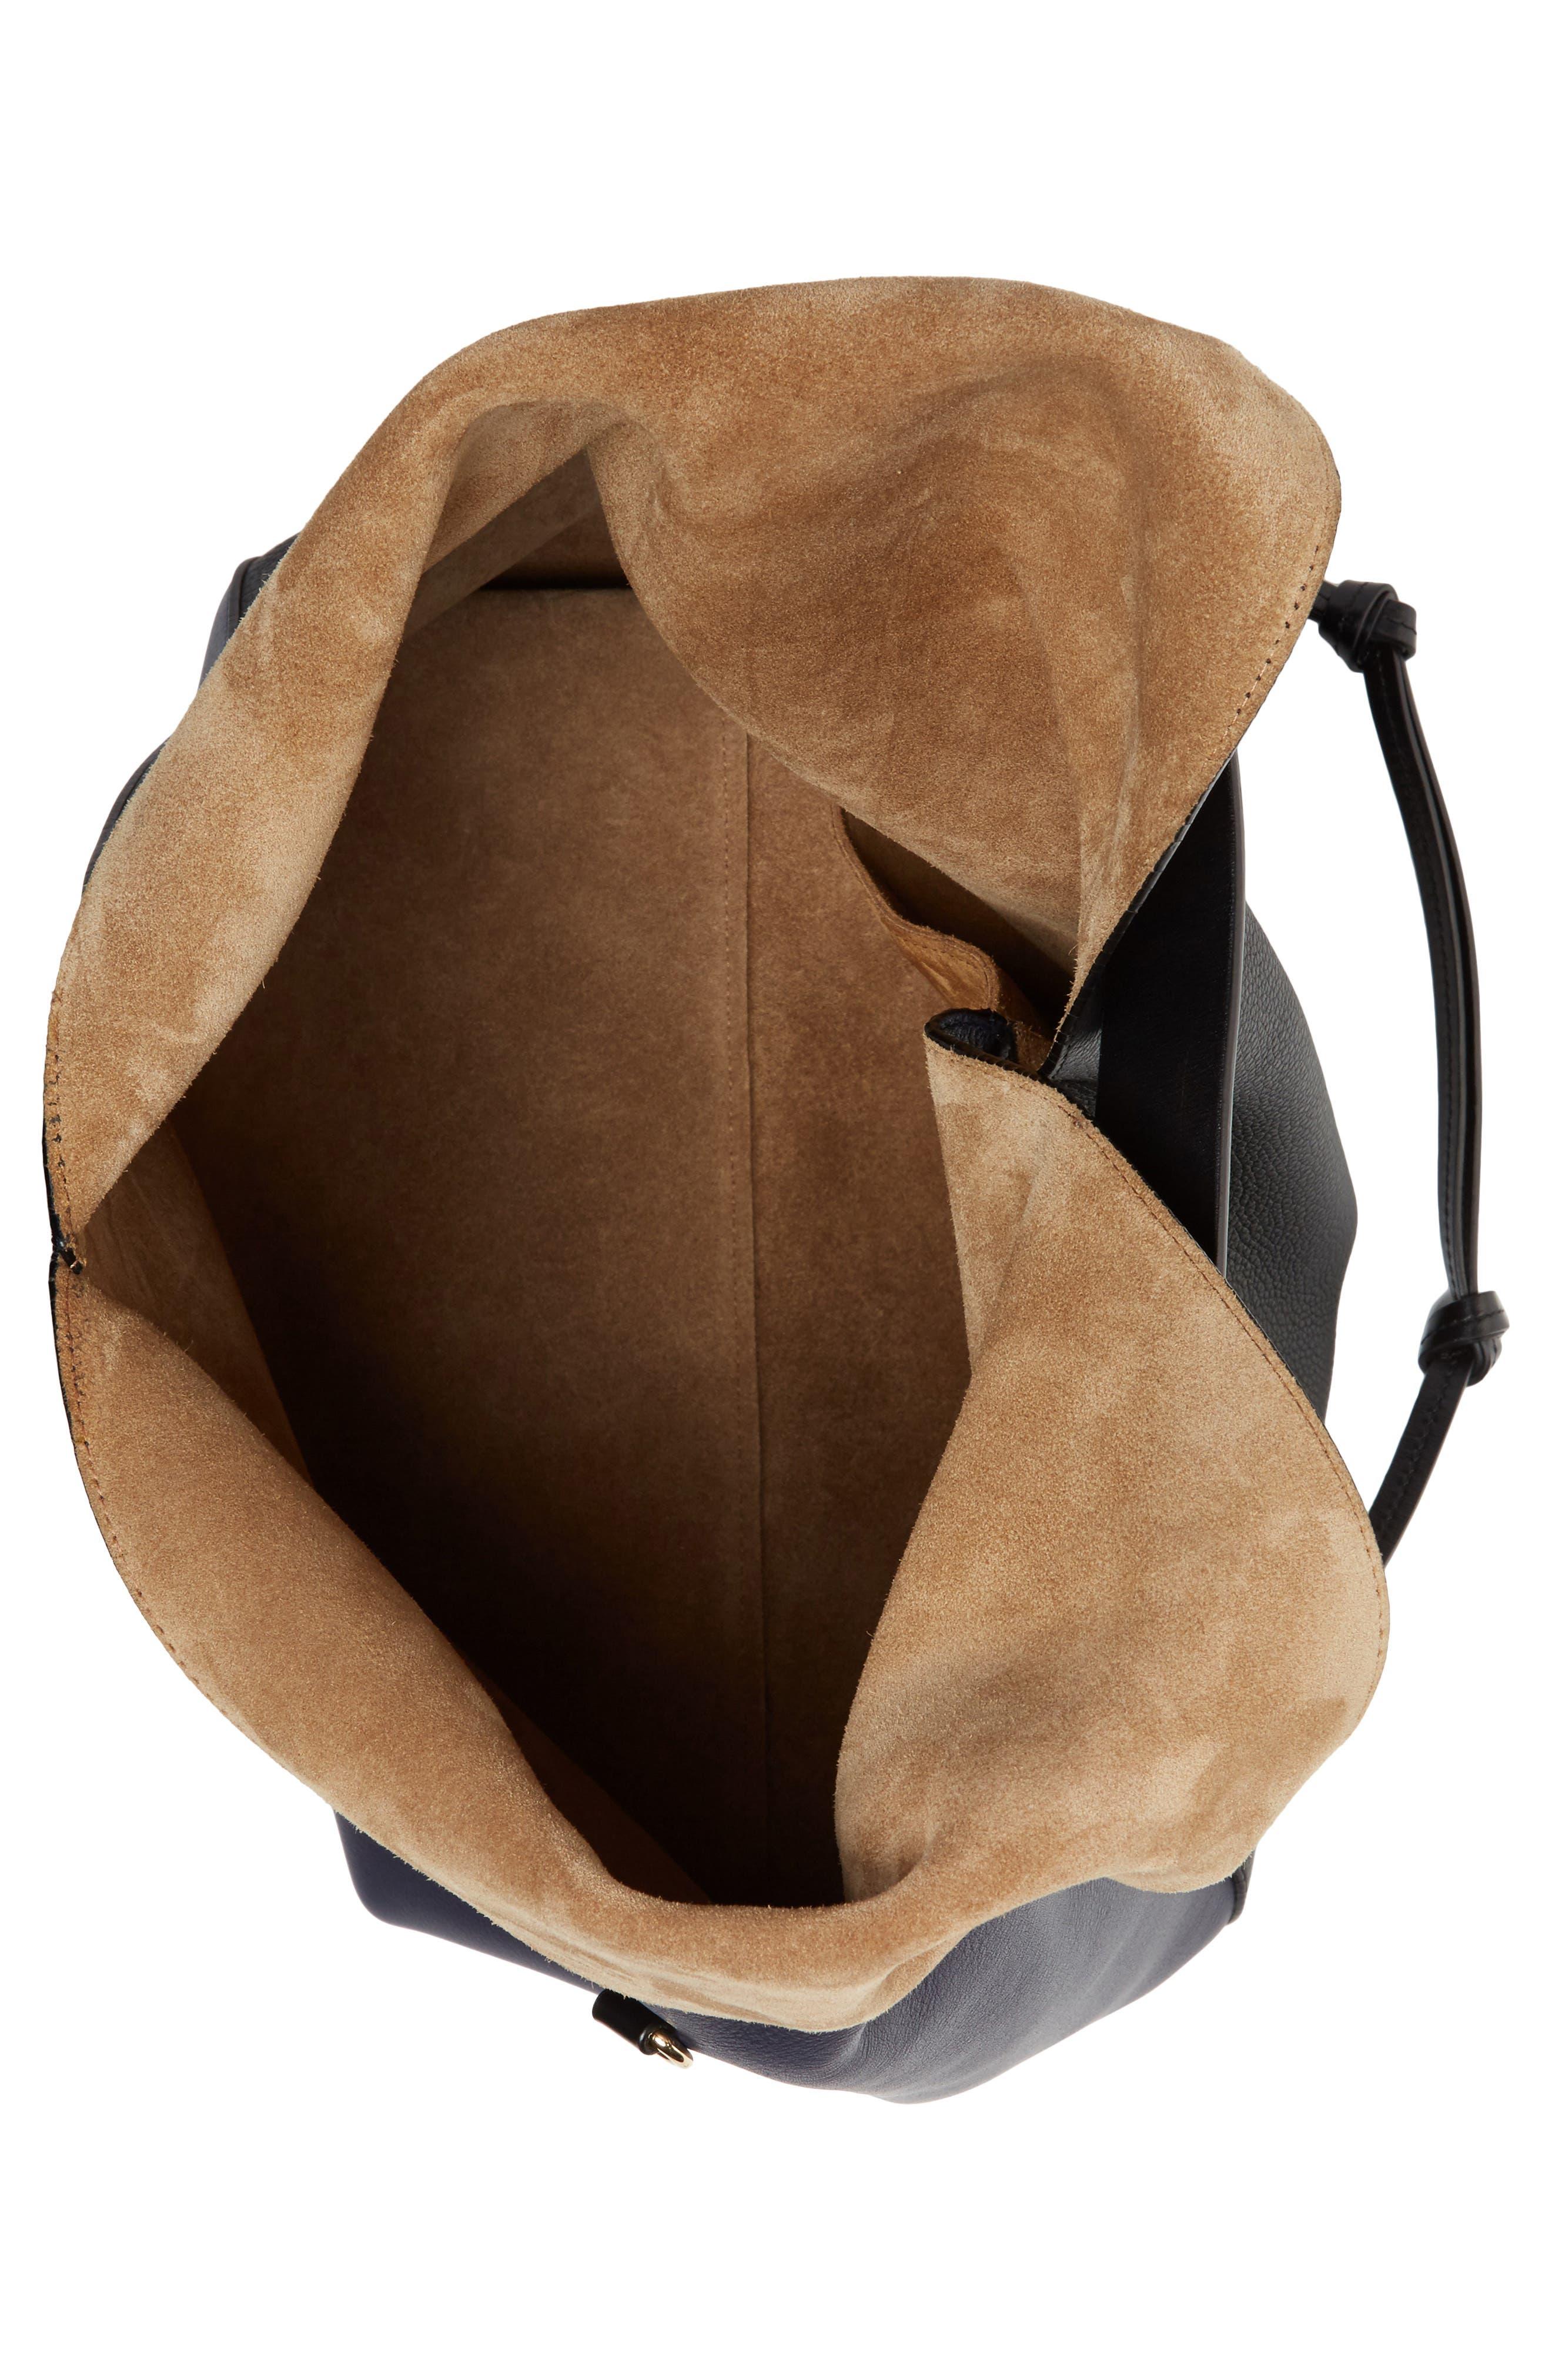 Calfskin Leather Sling Bag,                             Alternate thumbnail 3, color,                             Midnight Blue/ Black